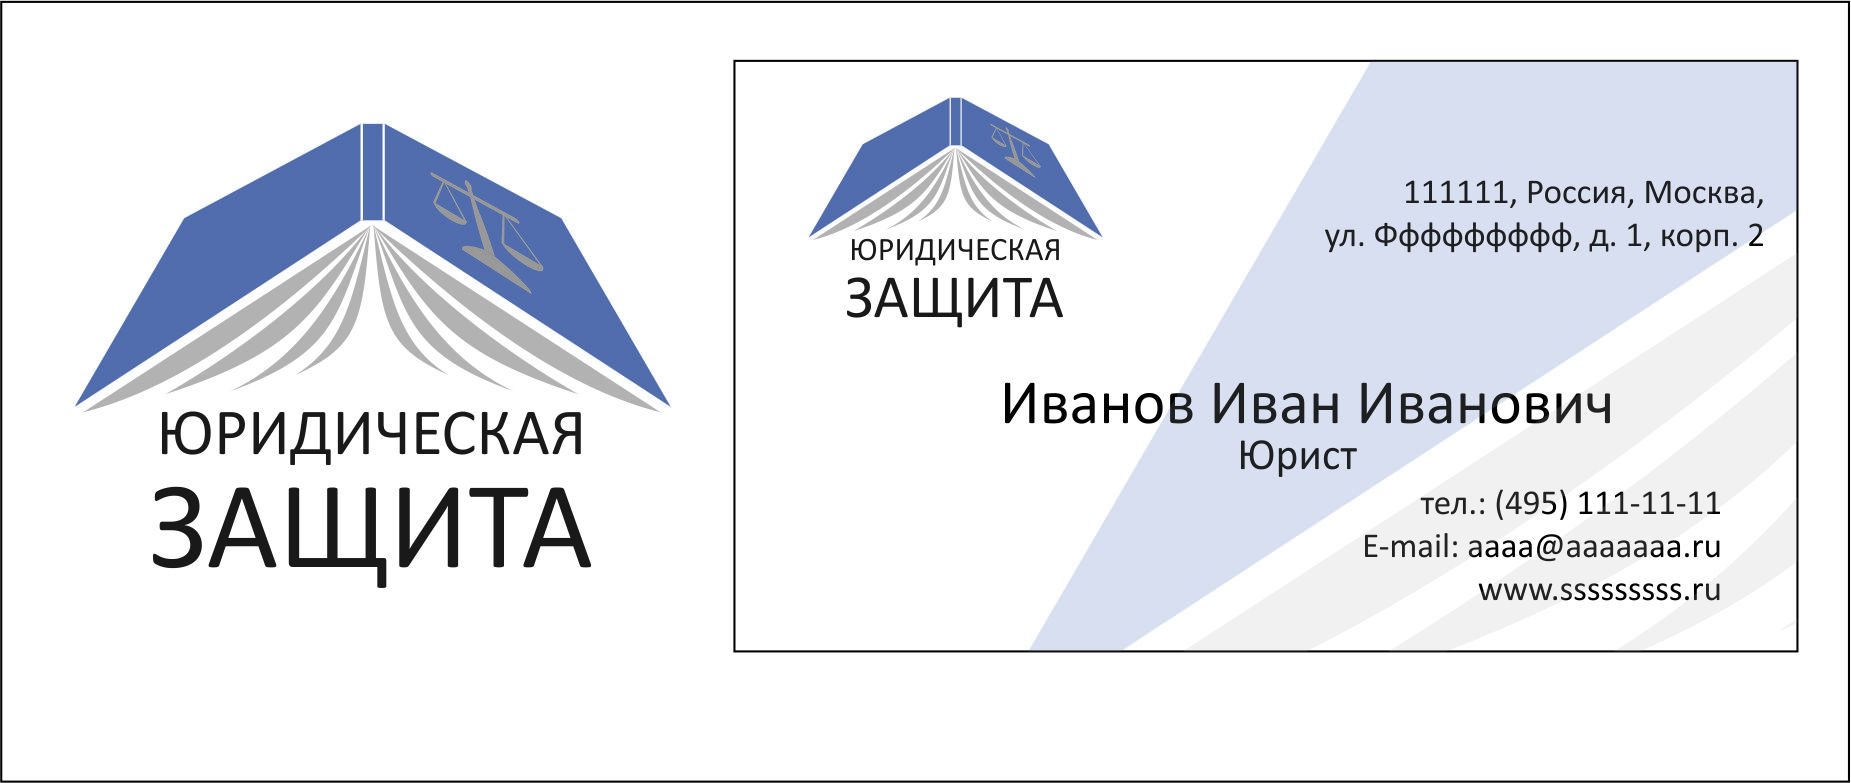 Разработка логотипа для юридической компании фото f_82755e04d78018c4.jpg